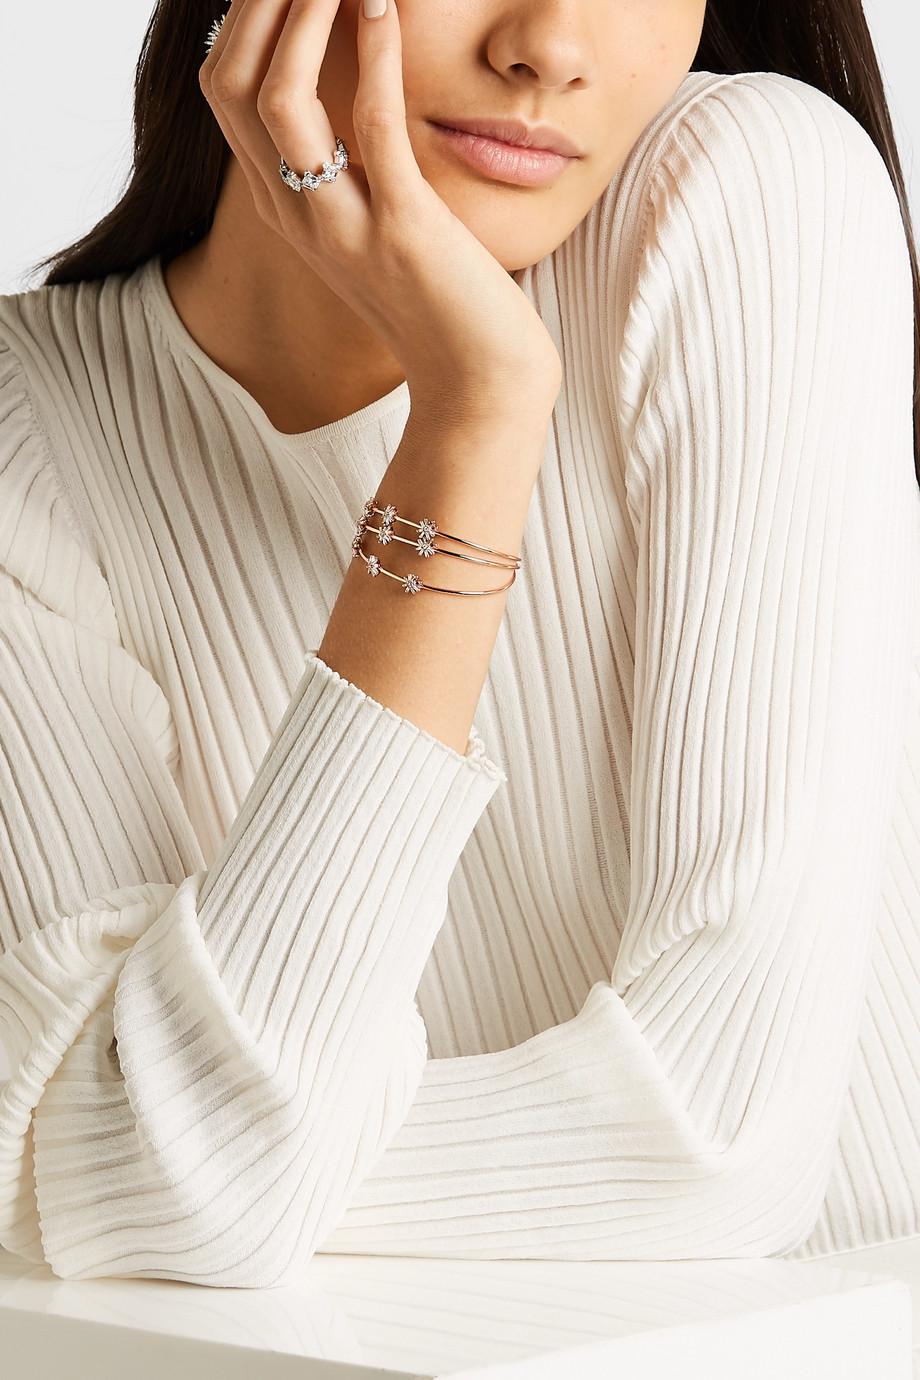 Suzanne Kalan 18-karat rose gold diamond cuff